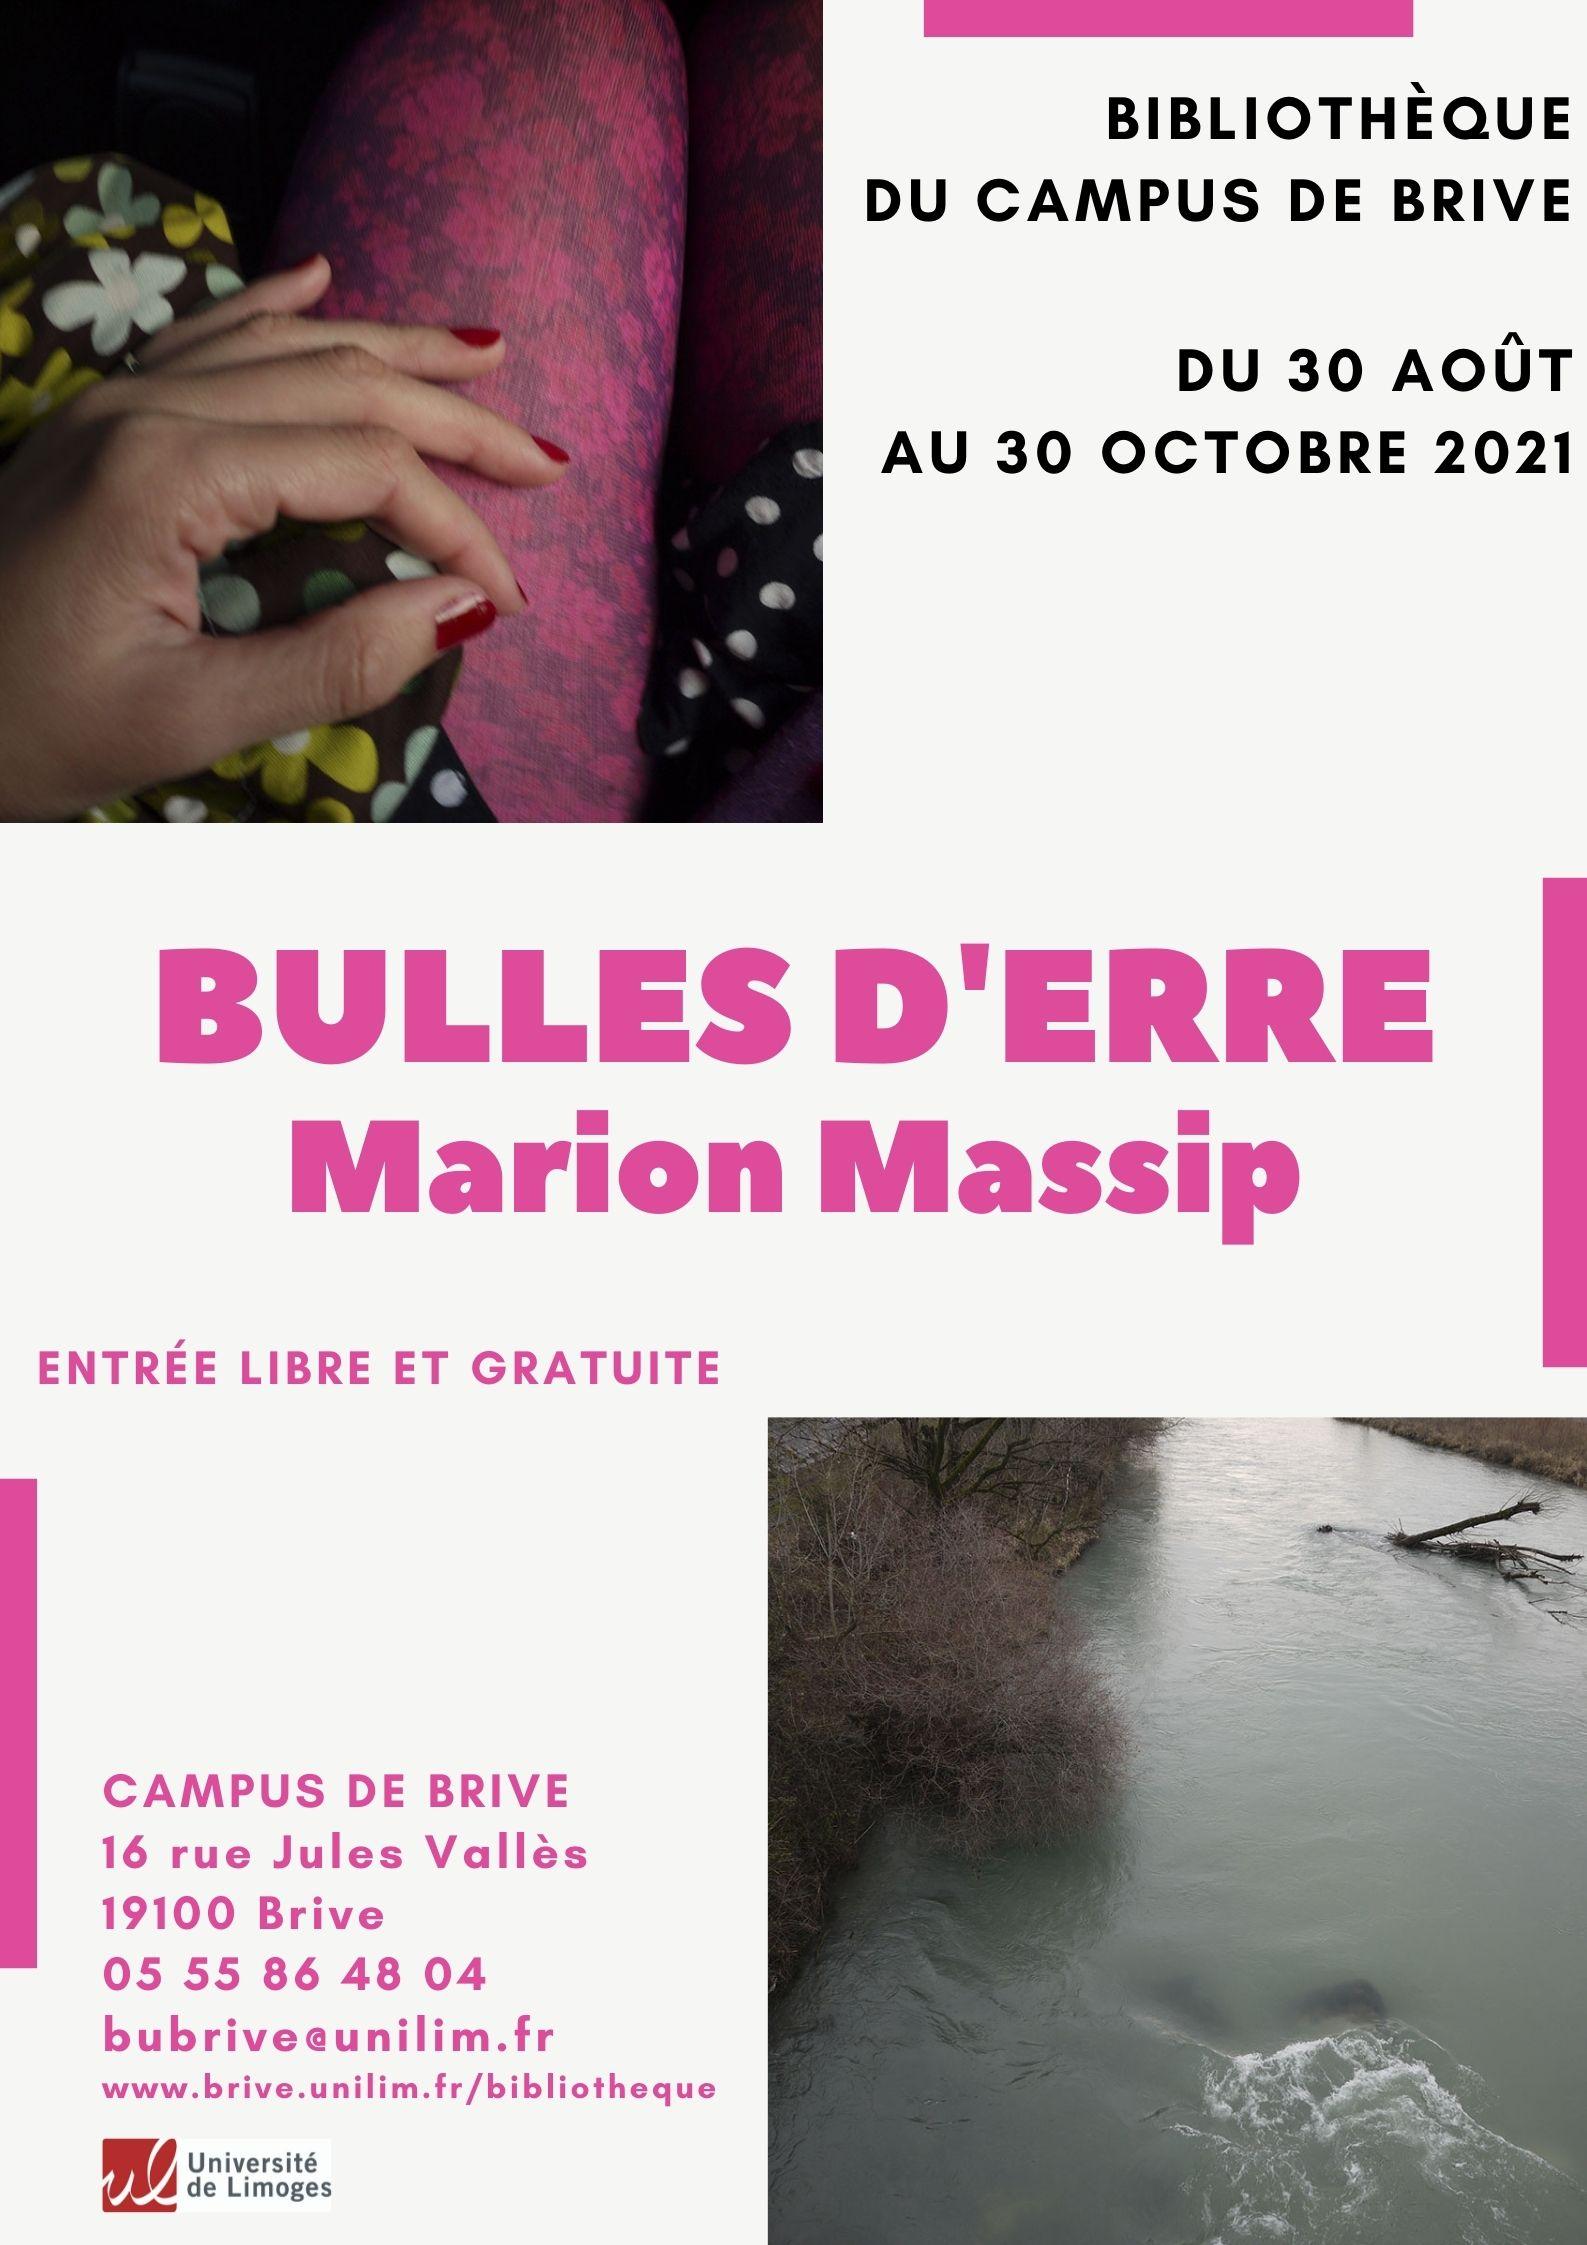 Exposition Bulles d'erre de Marion Massip